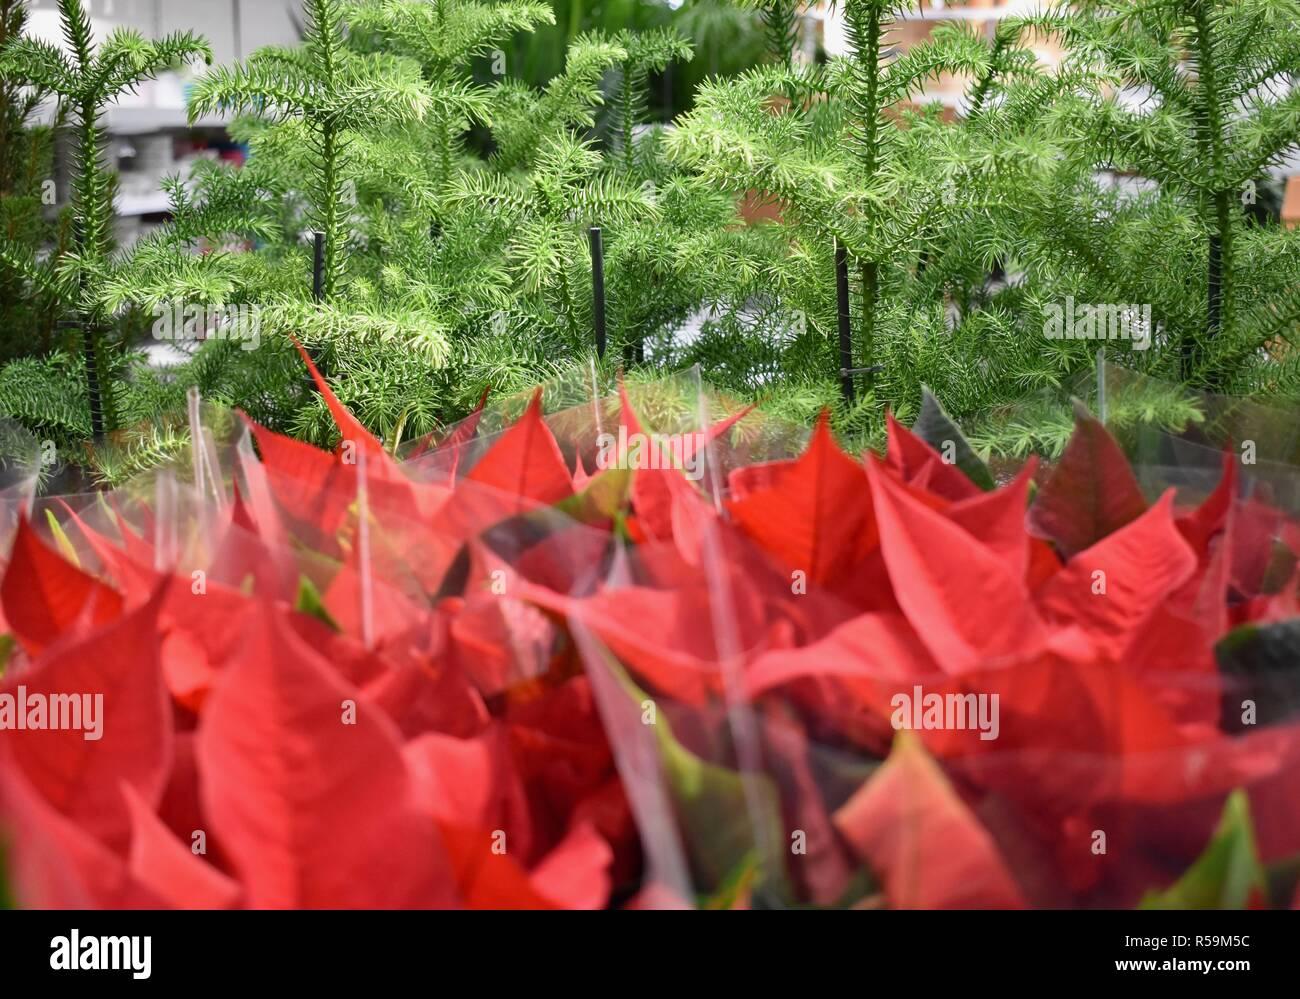 Poinsettia Red Flowers Euphorbia Pulcherrima And Christmas Trees